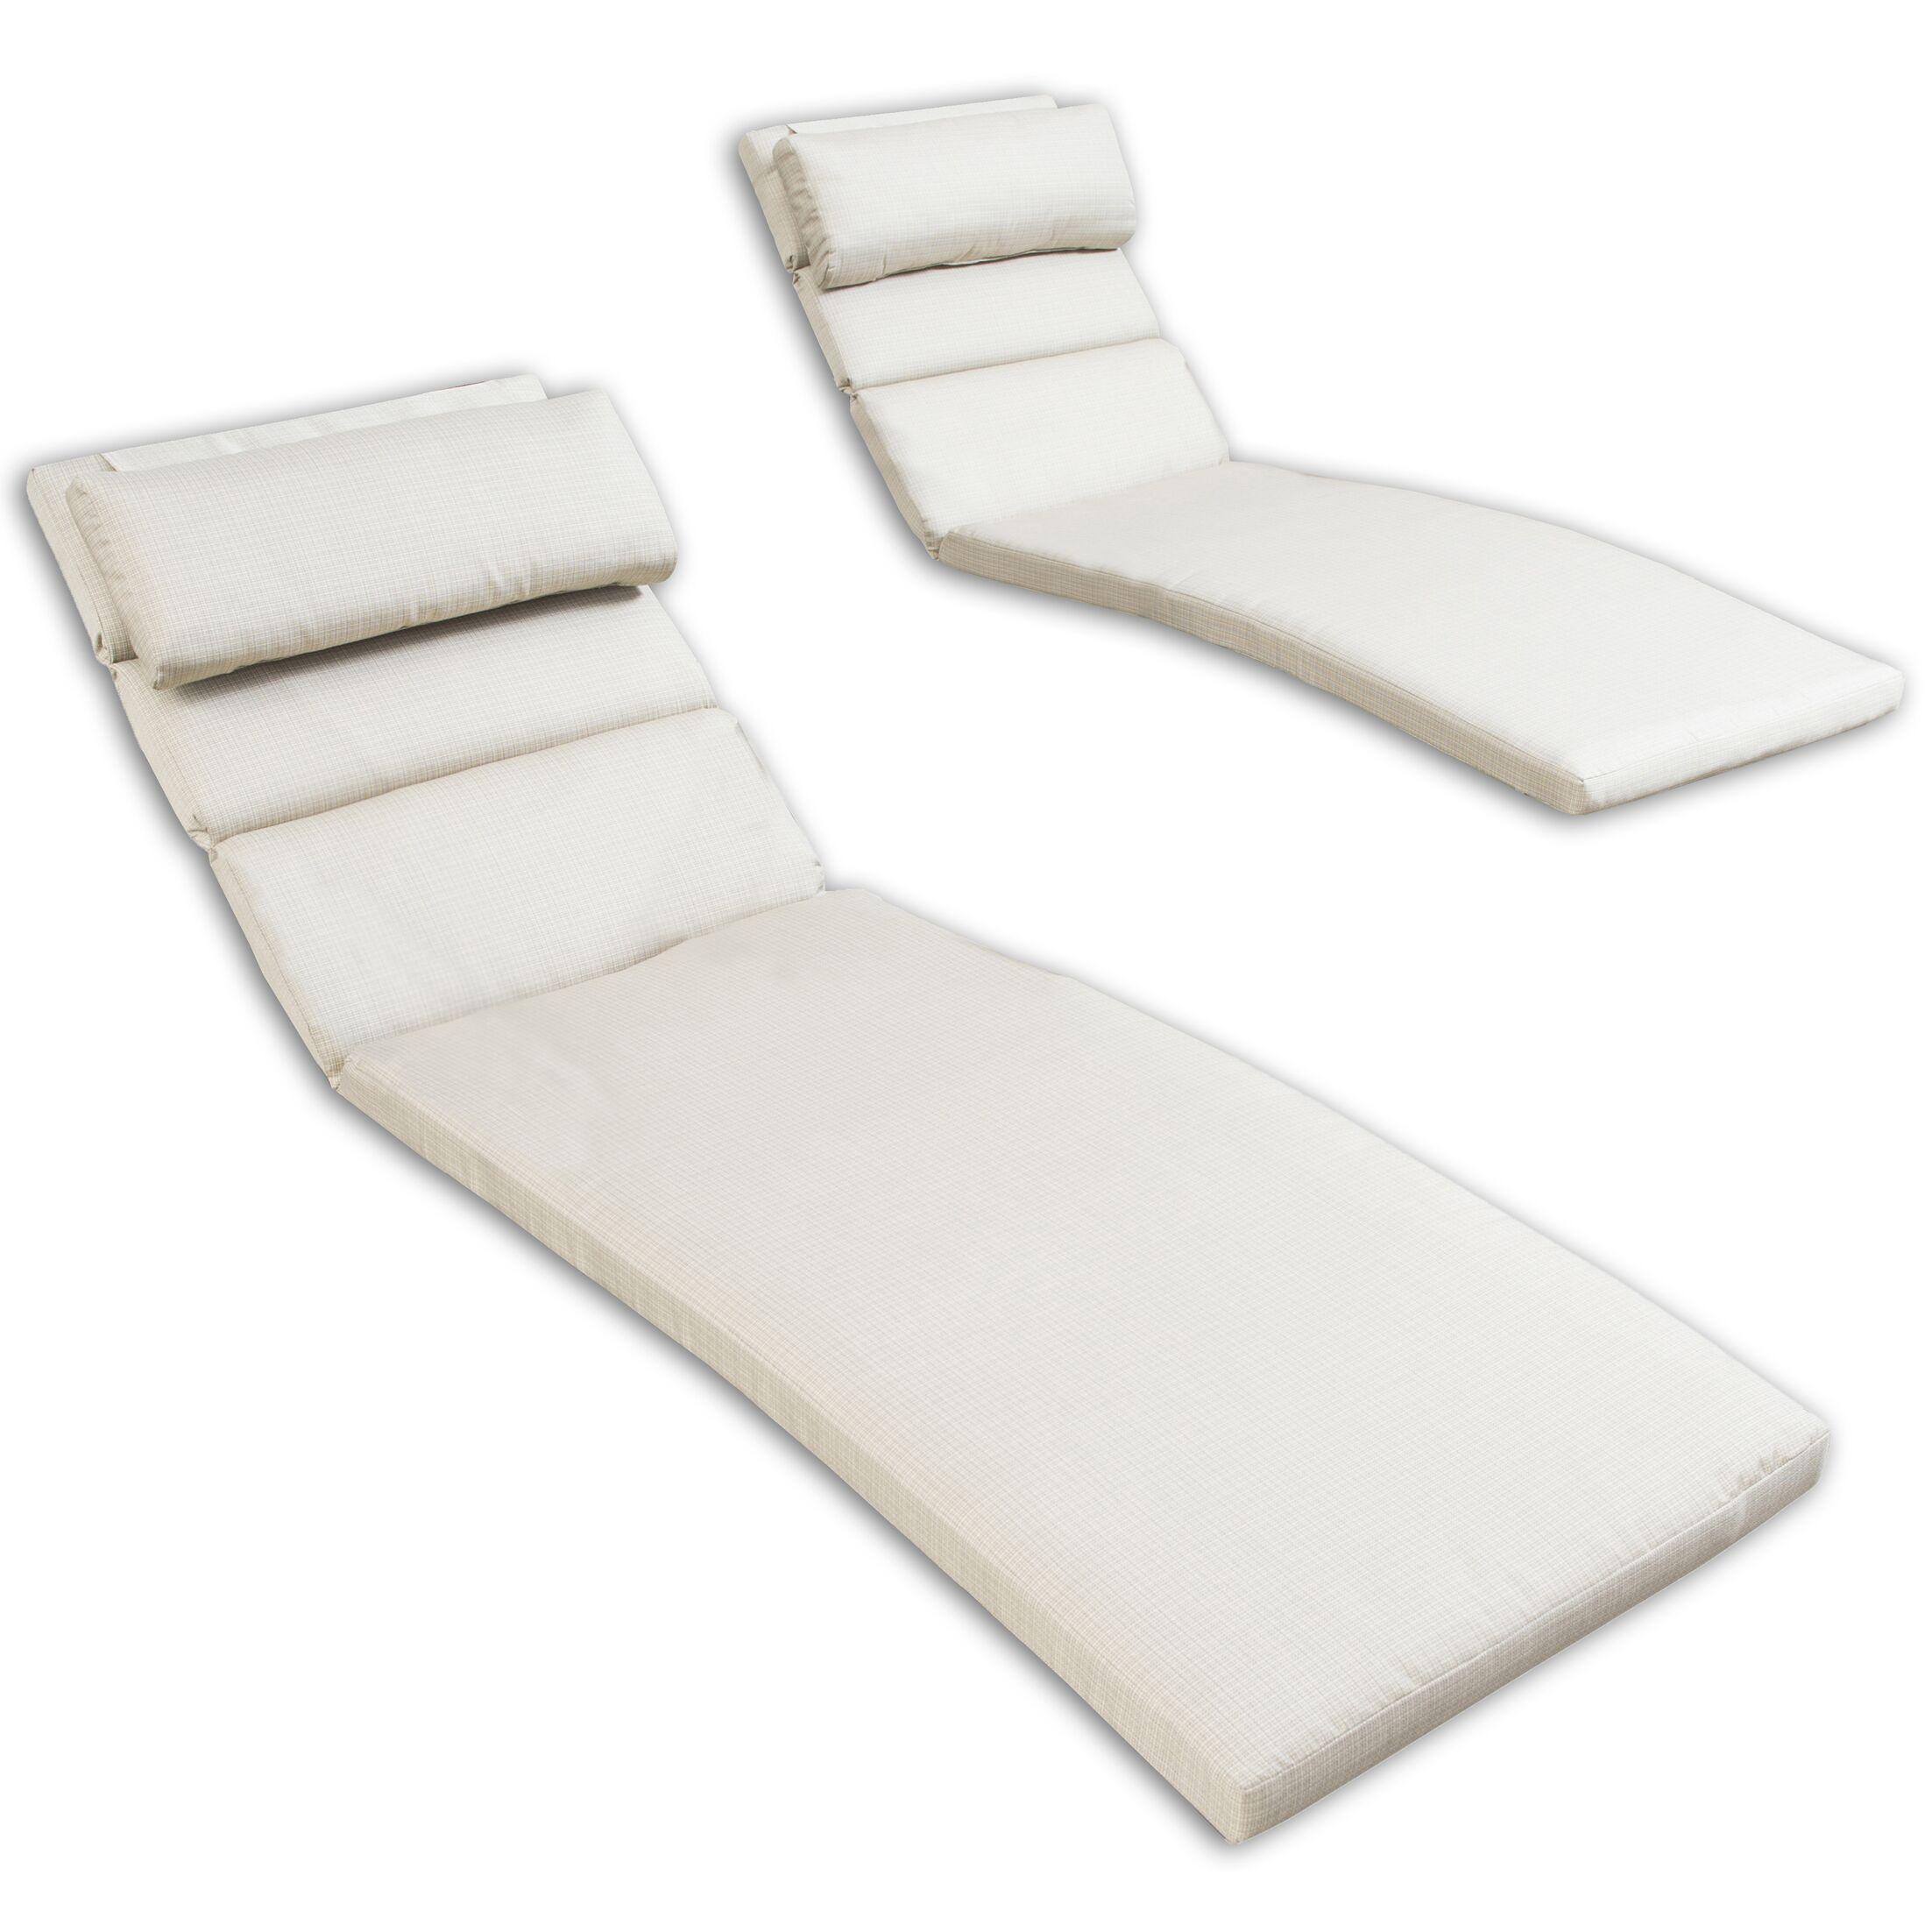 Northridge Outdoor Sunbrella Chaise Lounge Cushions Fabric: Slate Grey